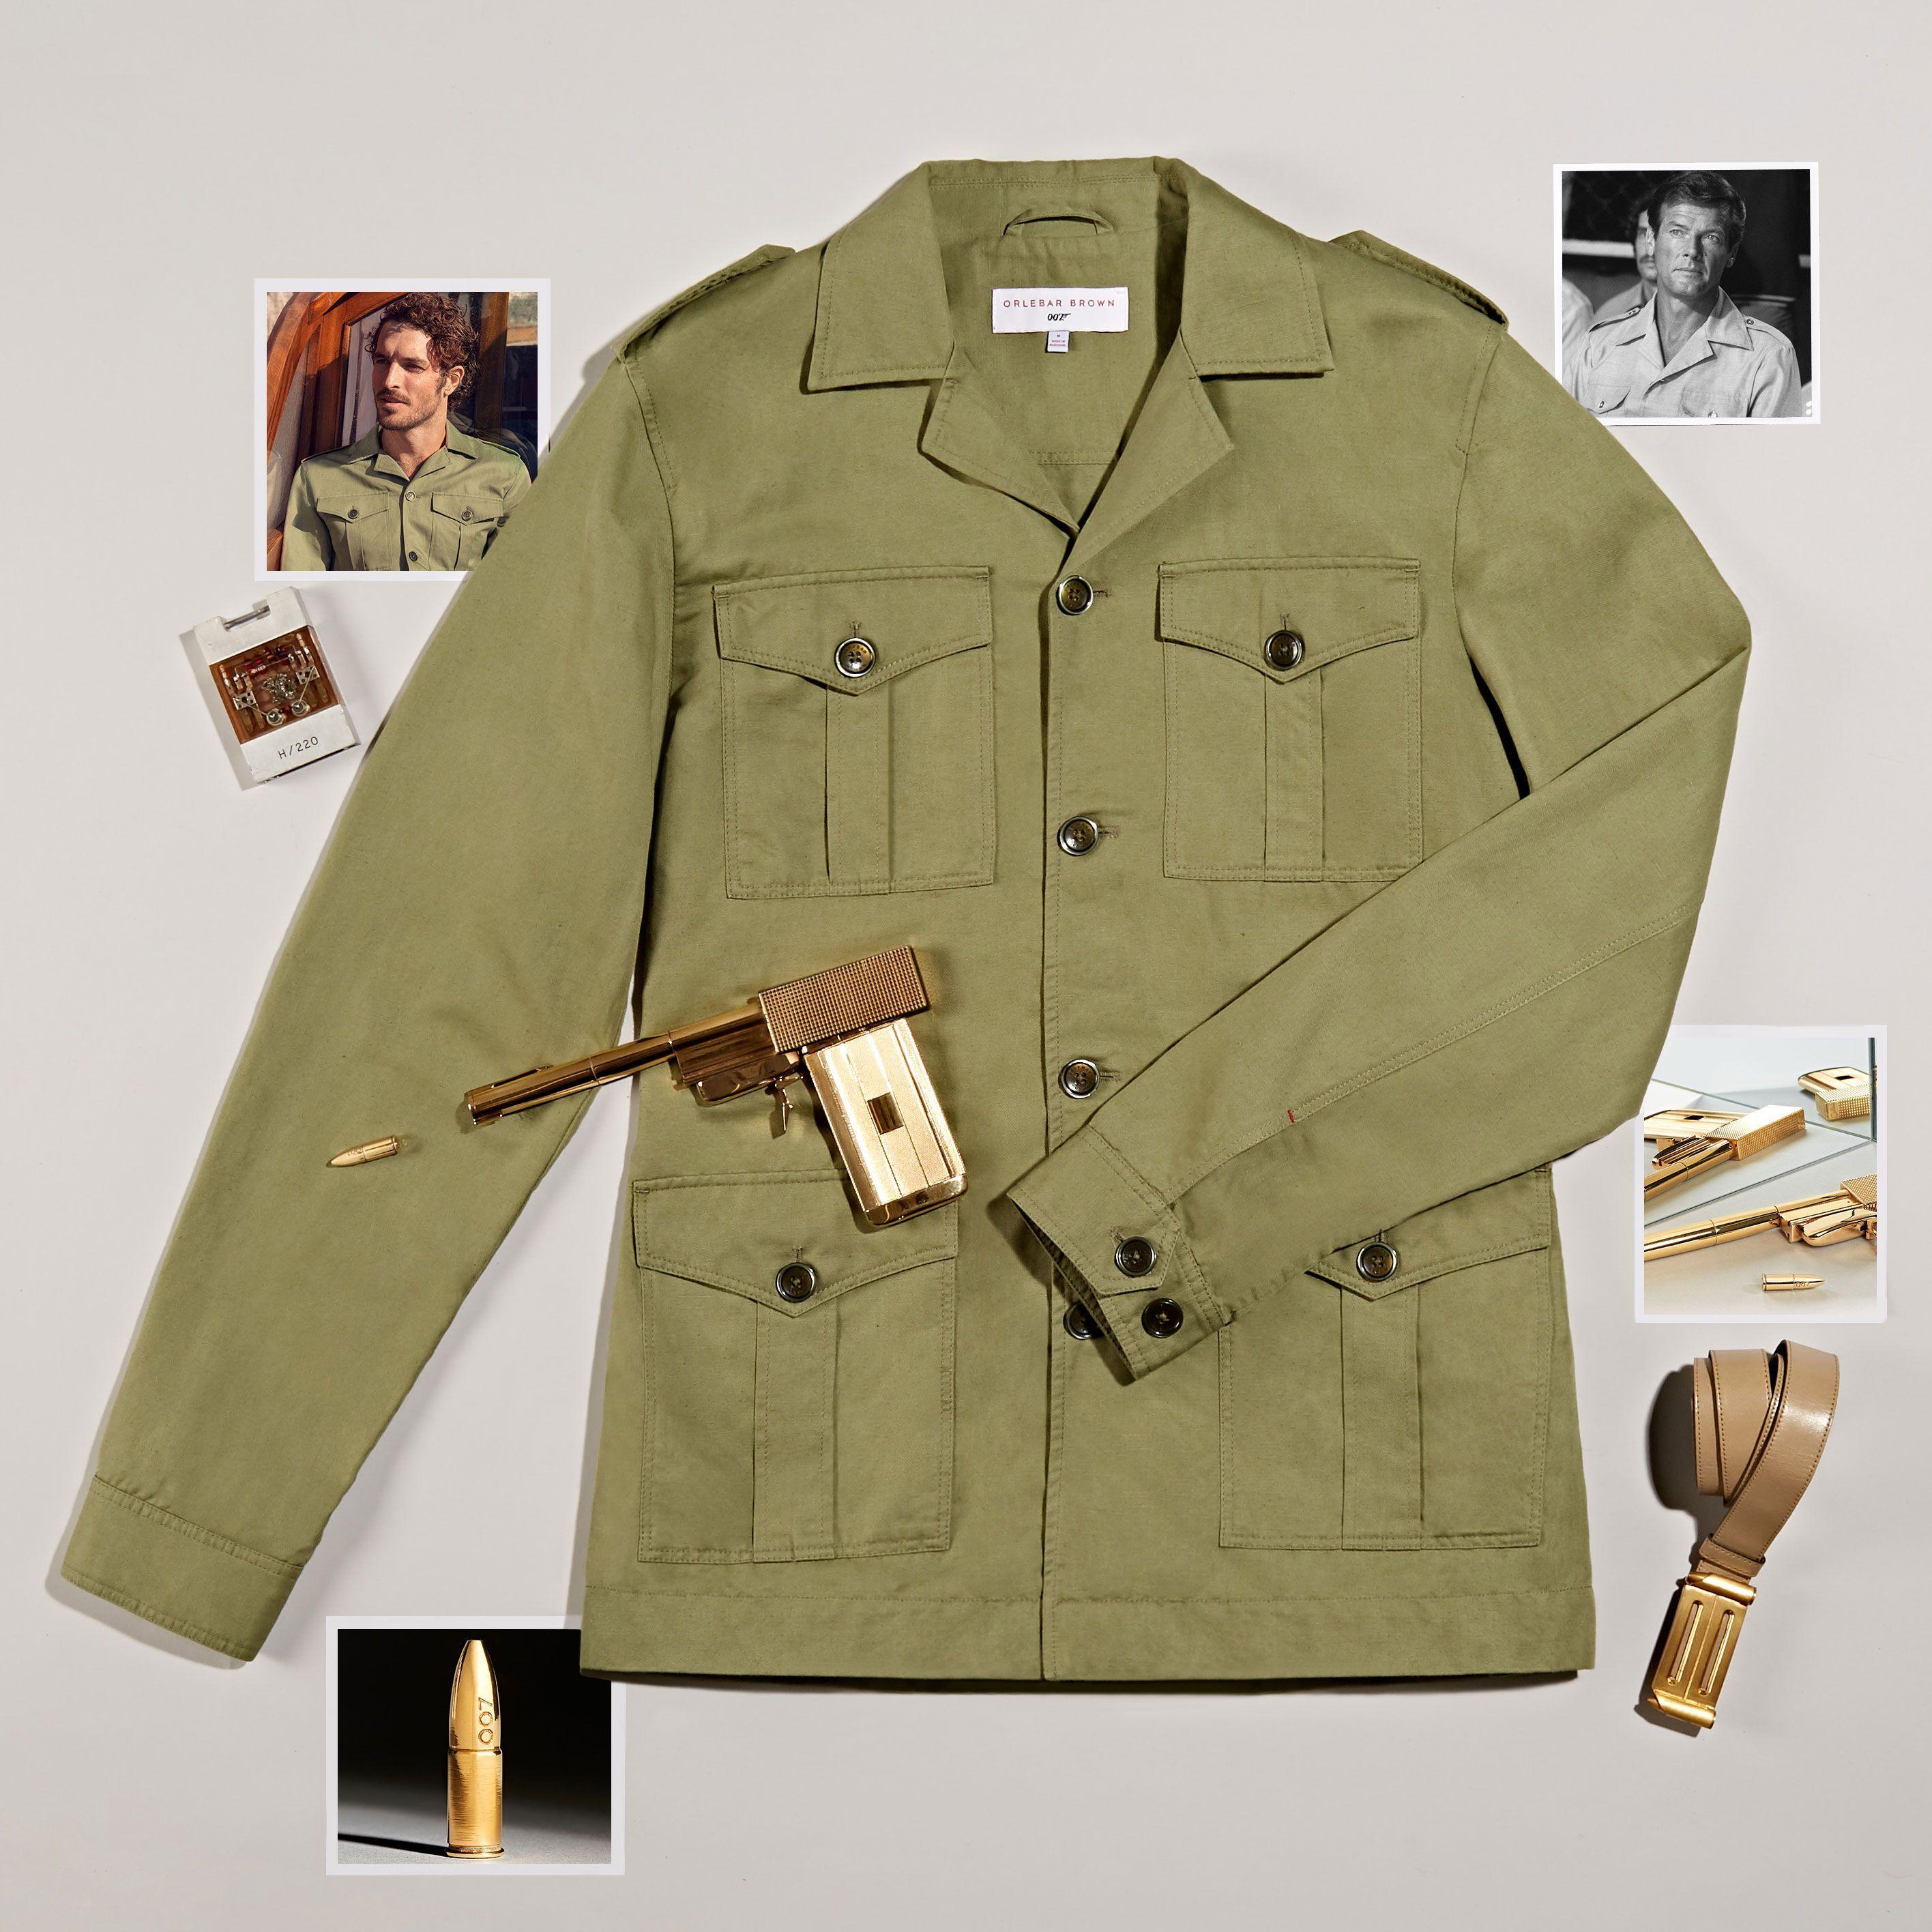 99ffae0270 Orlebar Brown James Bond Capsule Collection - How to Dress Like James Bond